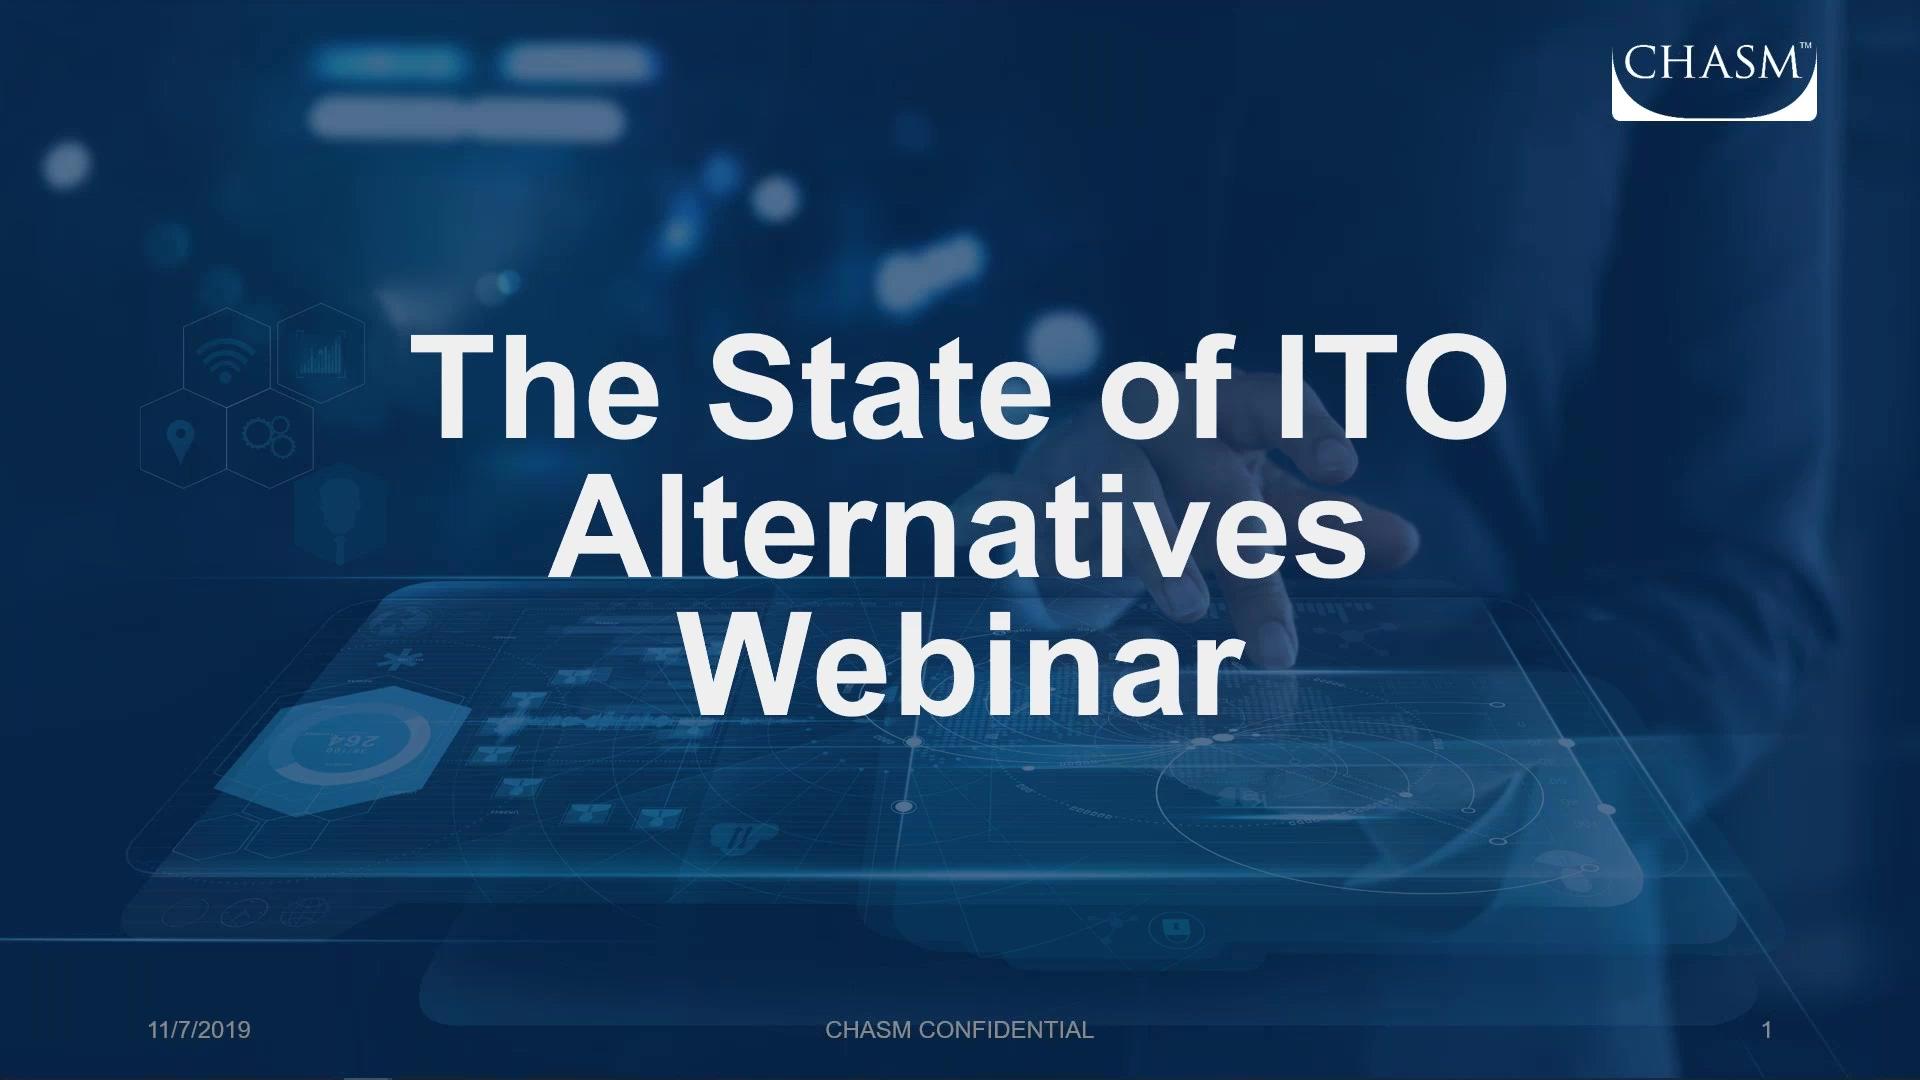 ( WEBINAR ) The State of - ITO Alternatives